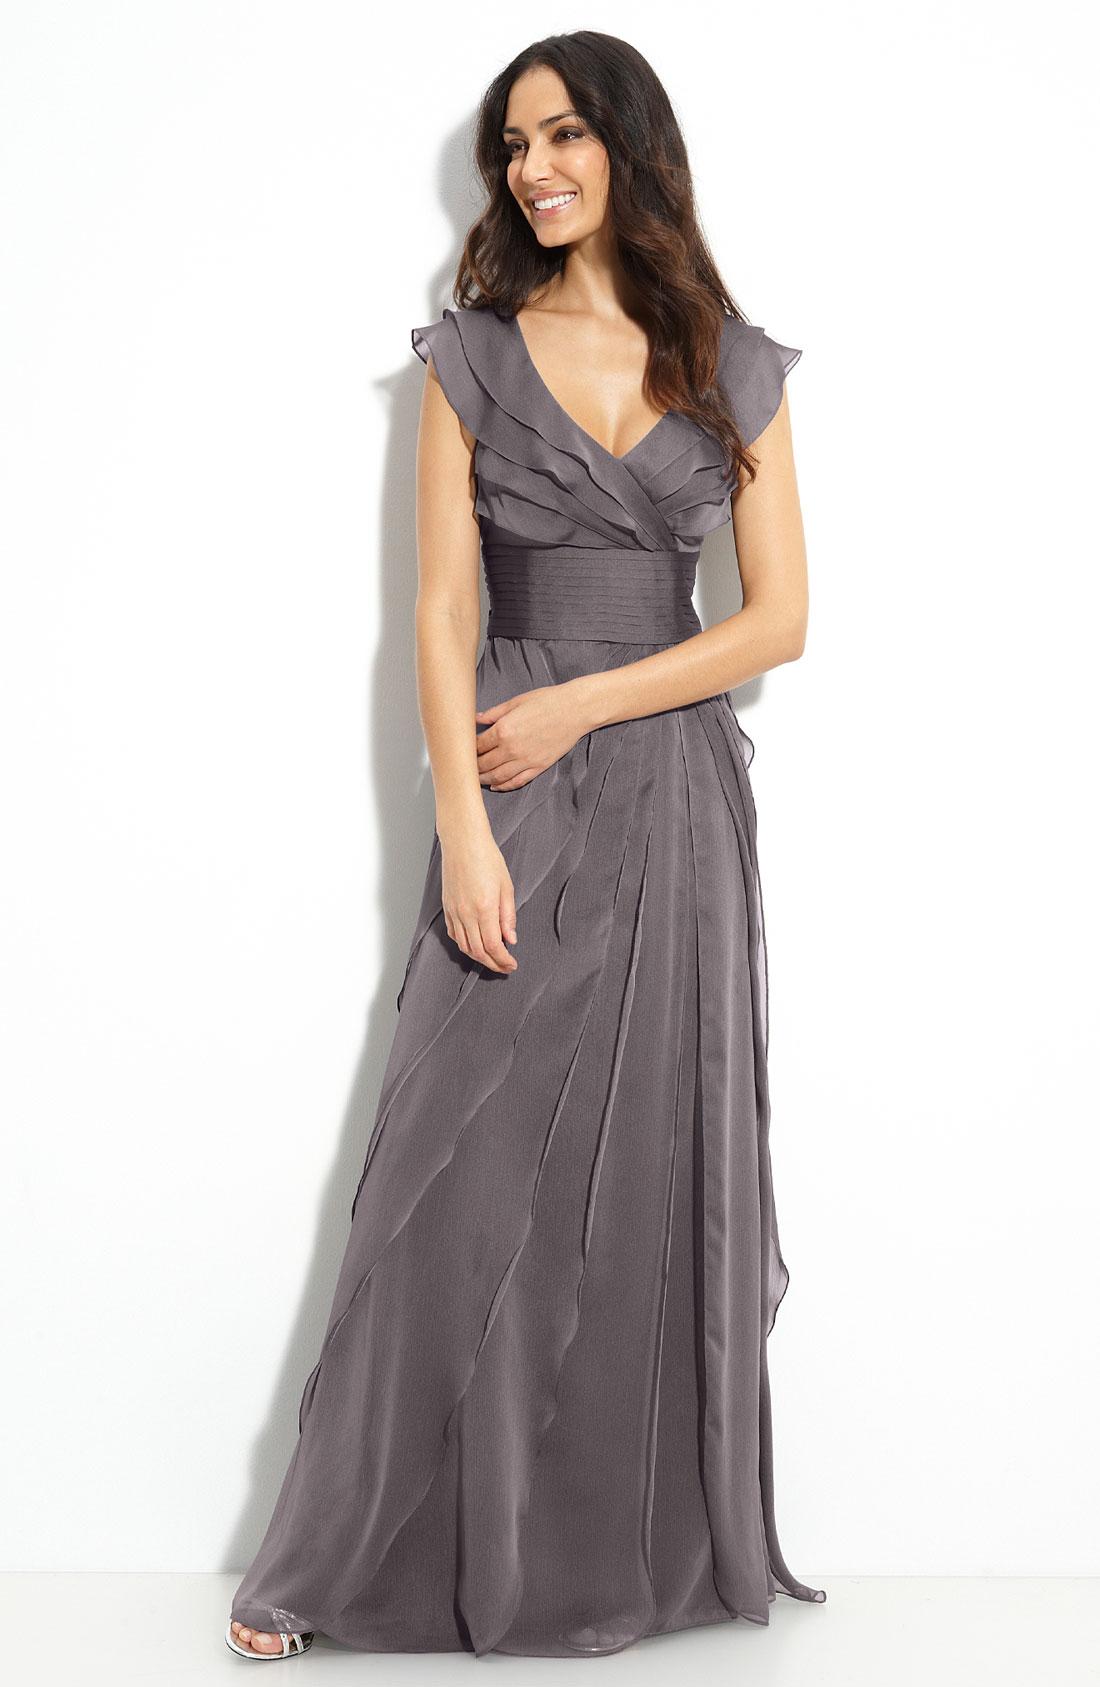 Adrianna Papell Chiffon Dress   Dress images